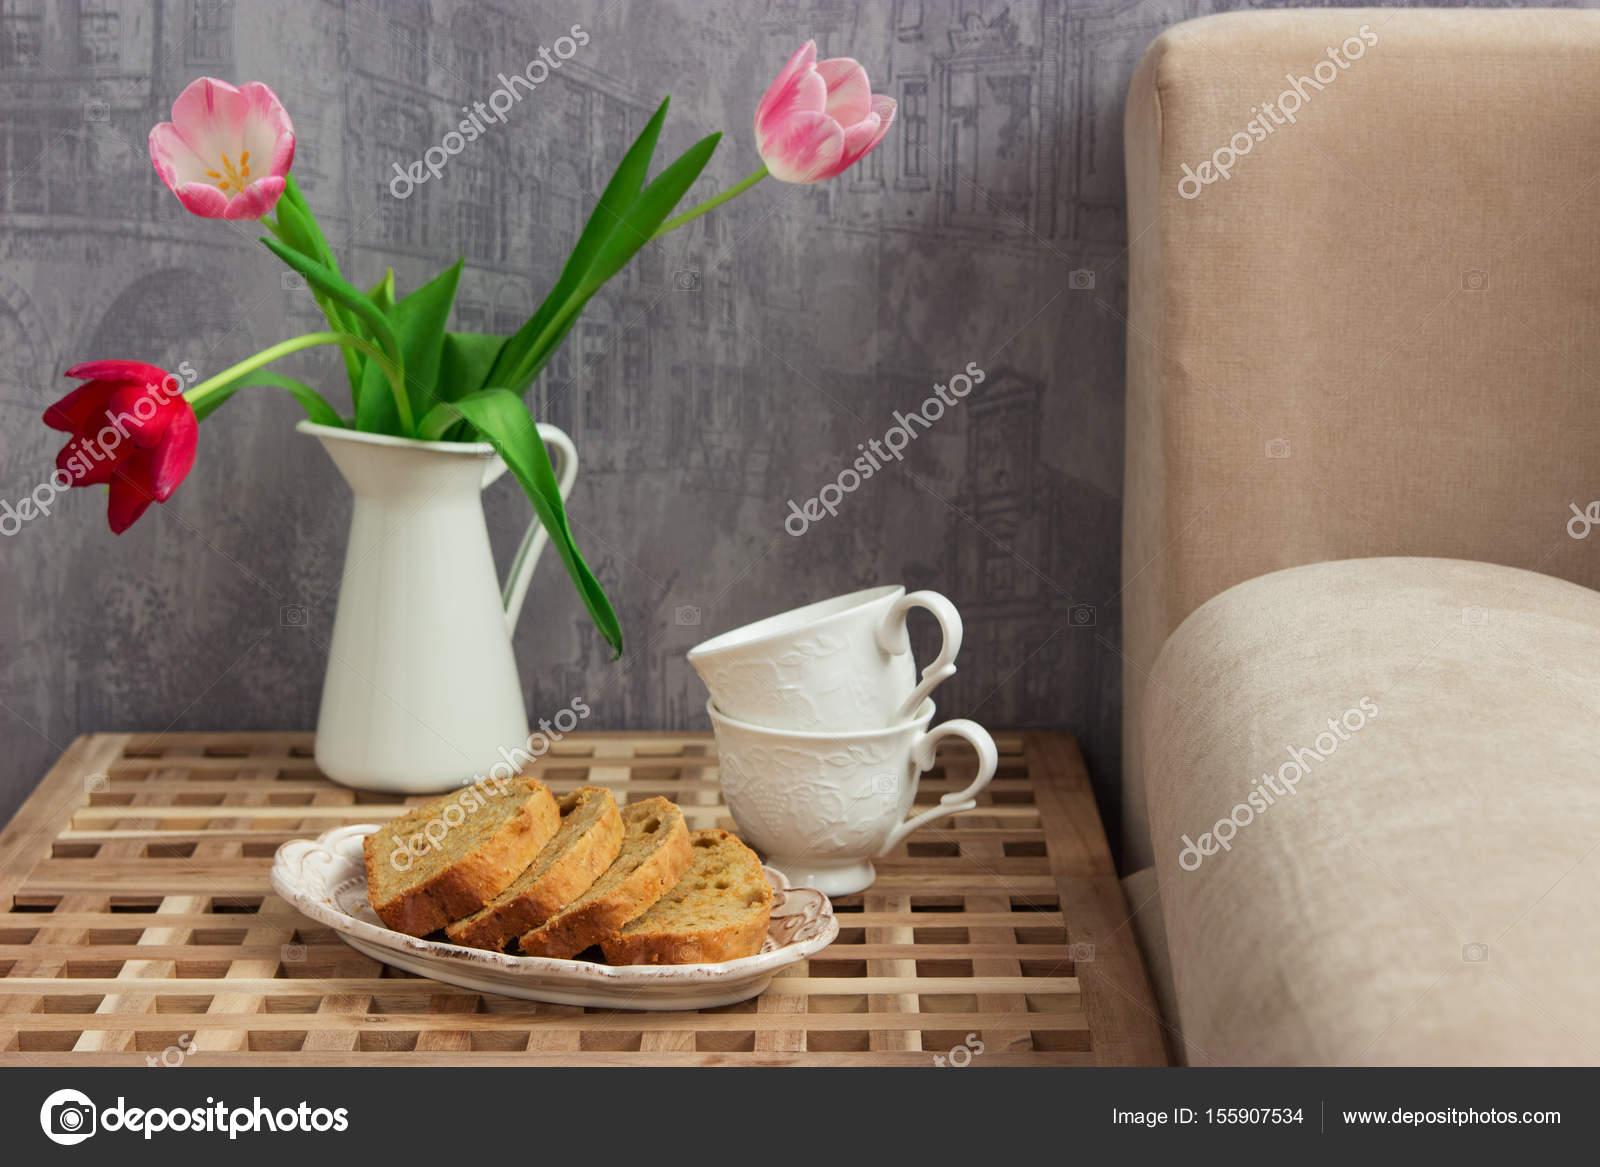 Zitronen Kuchen Tisch Bett — Stockfoto © Spring_melody #155907534